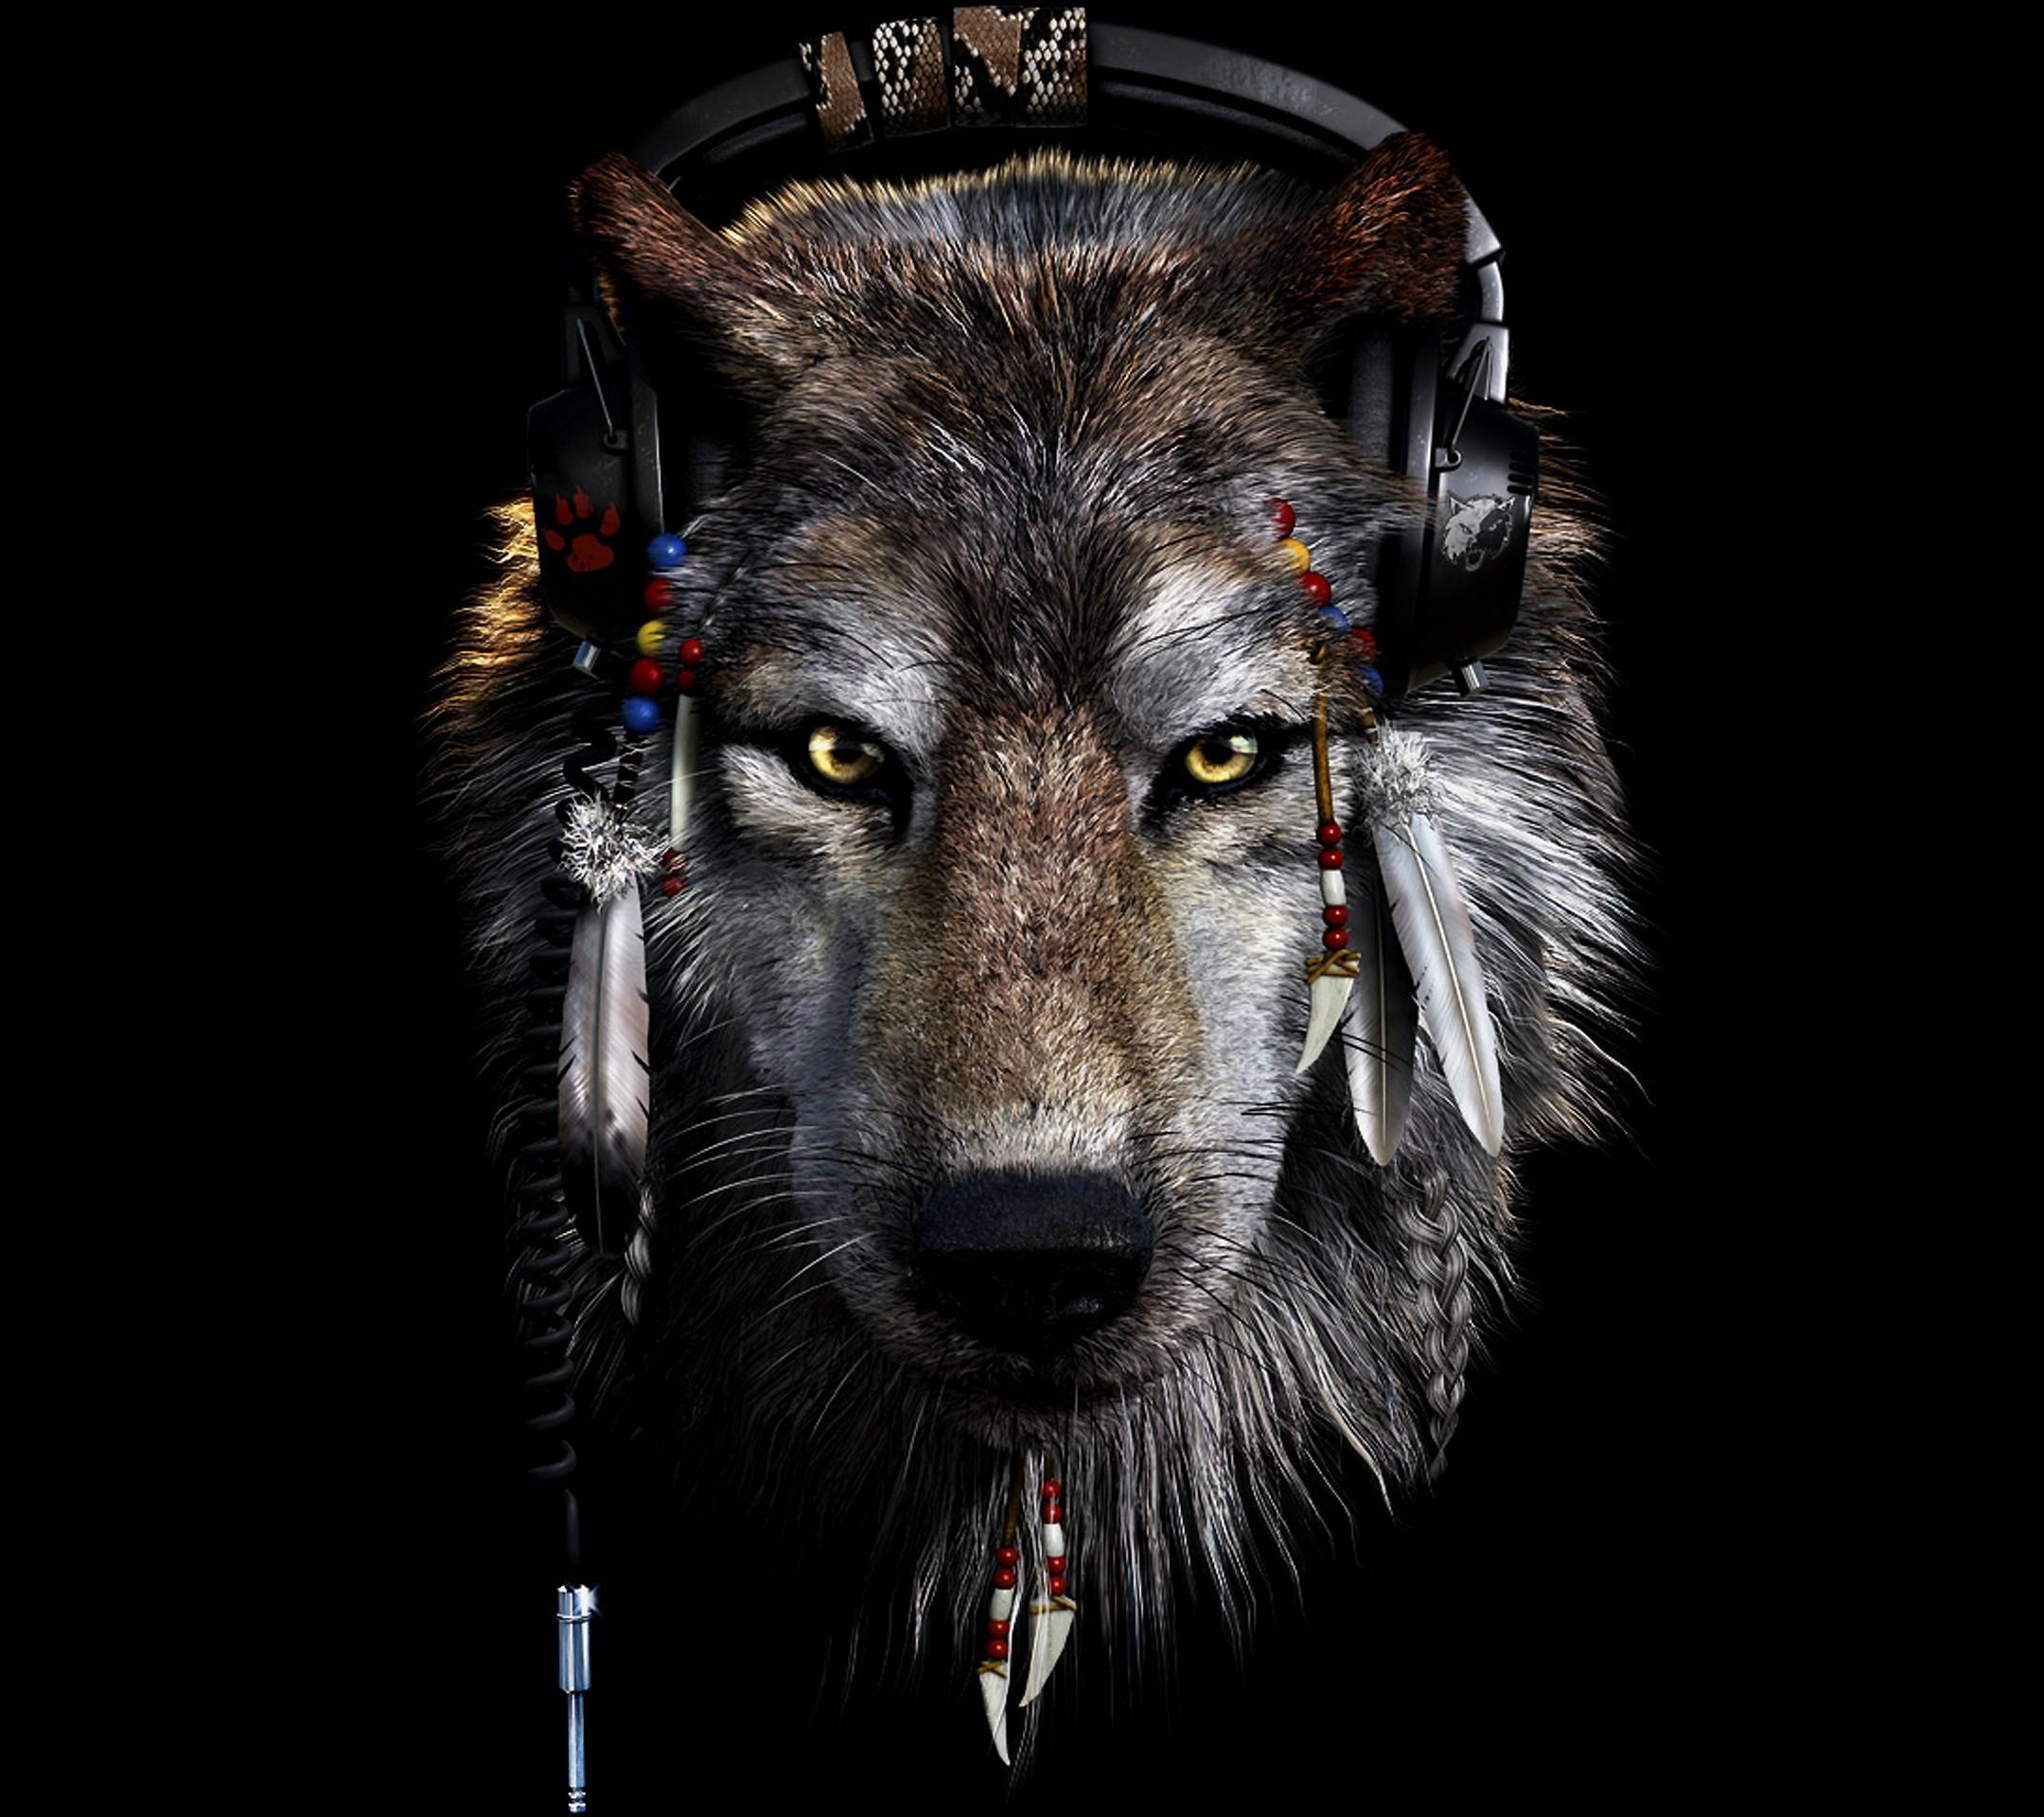 Black Werewolf Wallpaper (62+ Images